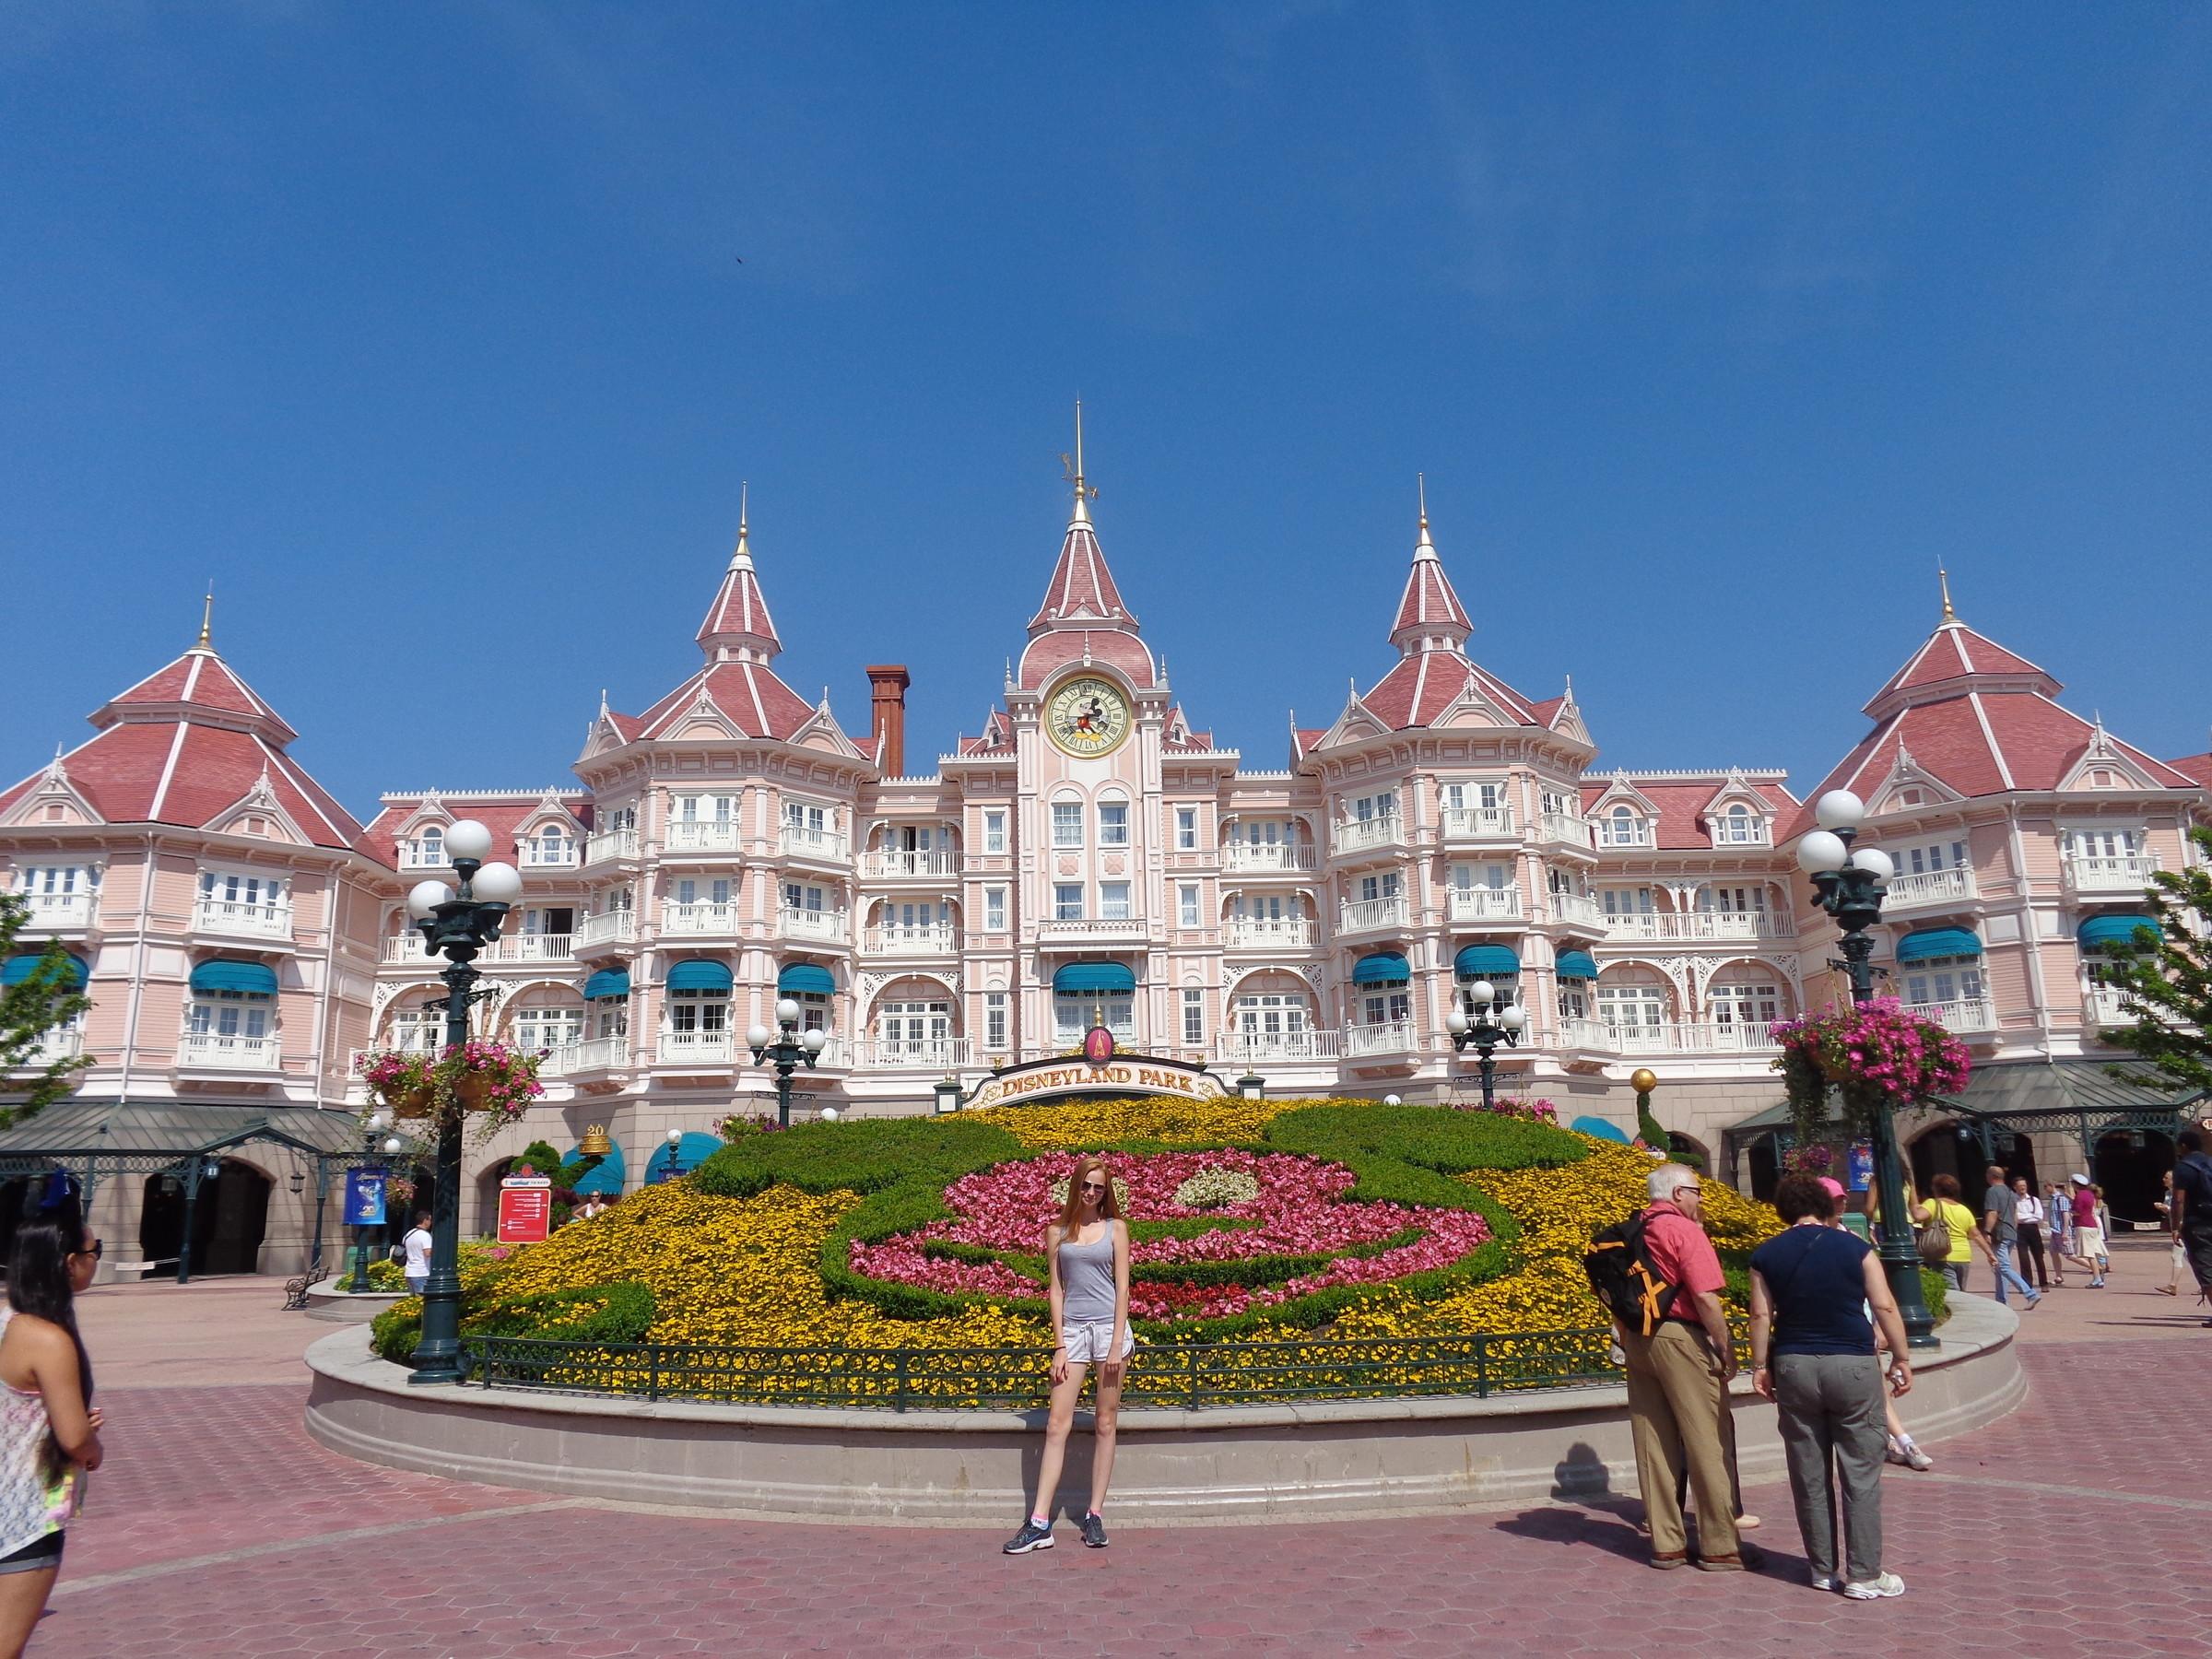 Disneyland Paris - Wikipedia Disneyland hotel paris pictures